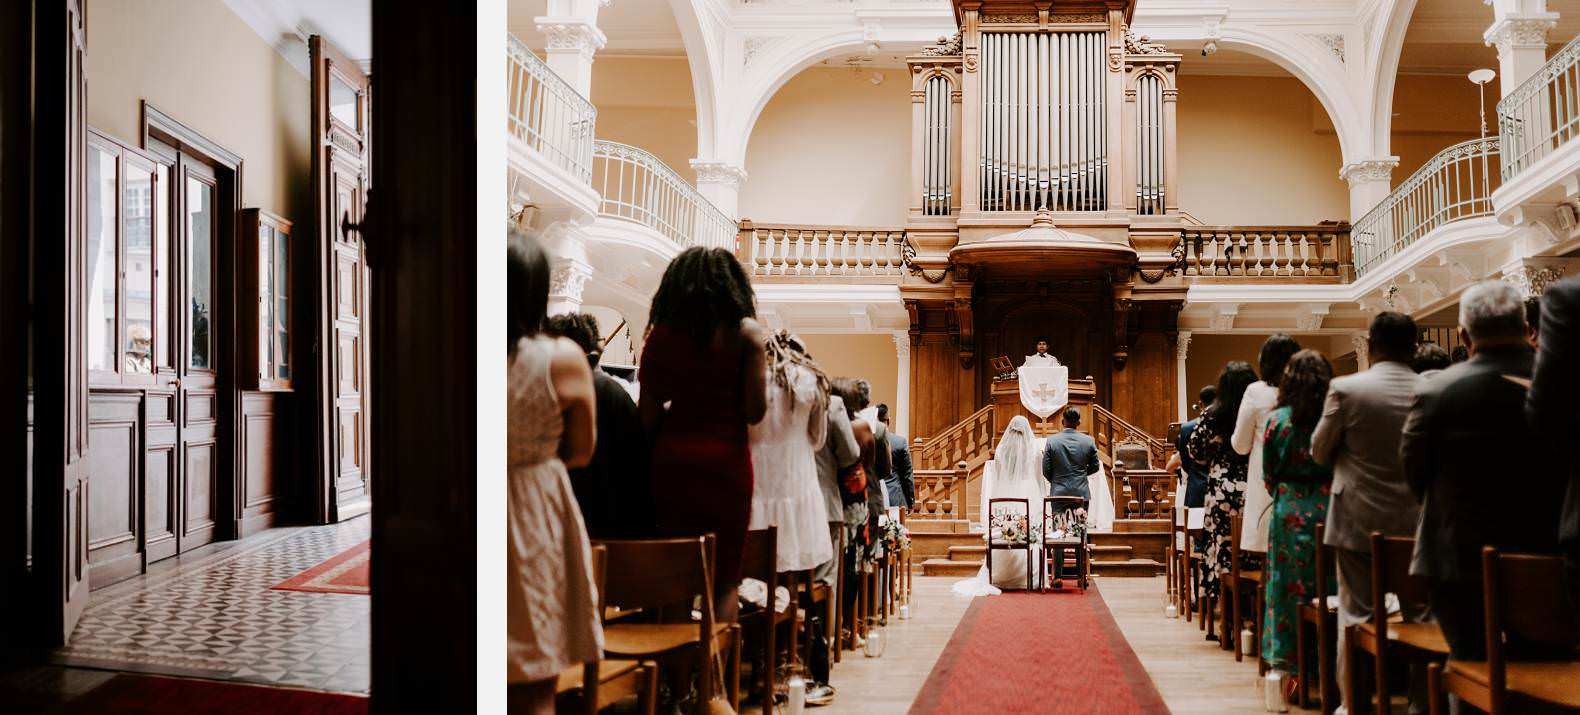 mariage manoir de corny photographe bel esprit 0020 1